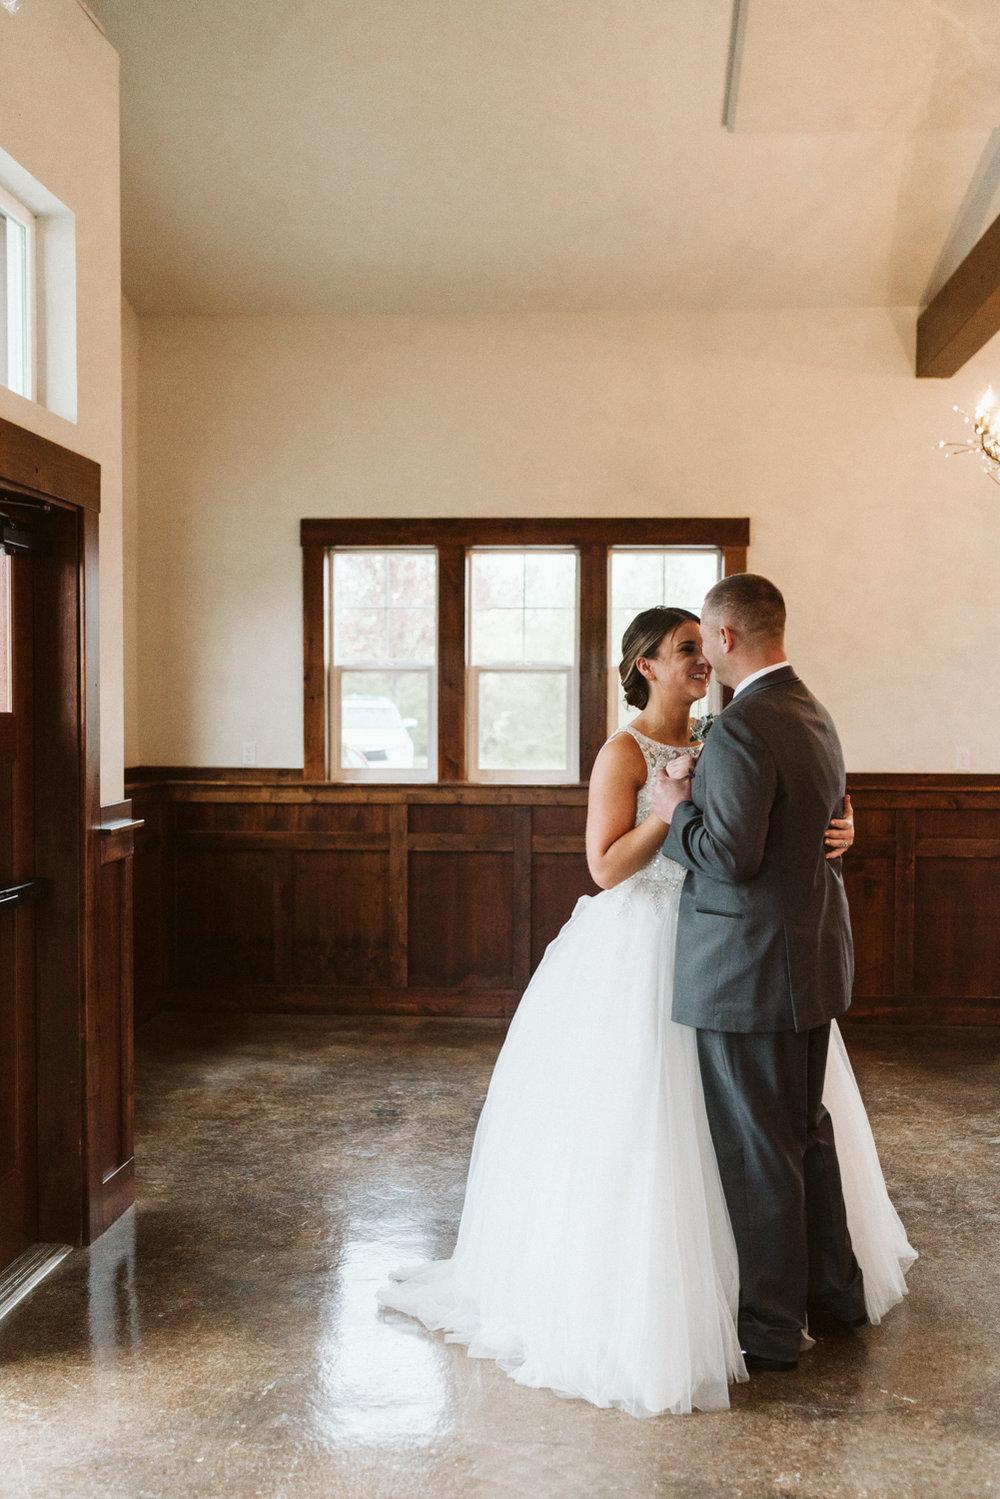 April Yentas Photography - jen and anthony wedding-75.jpg